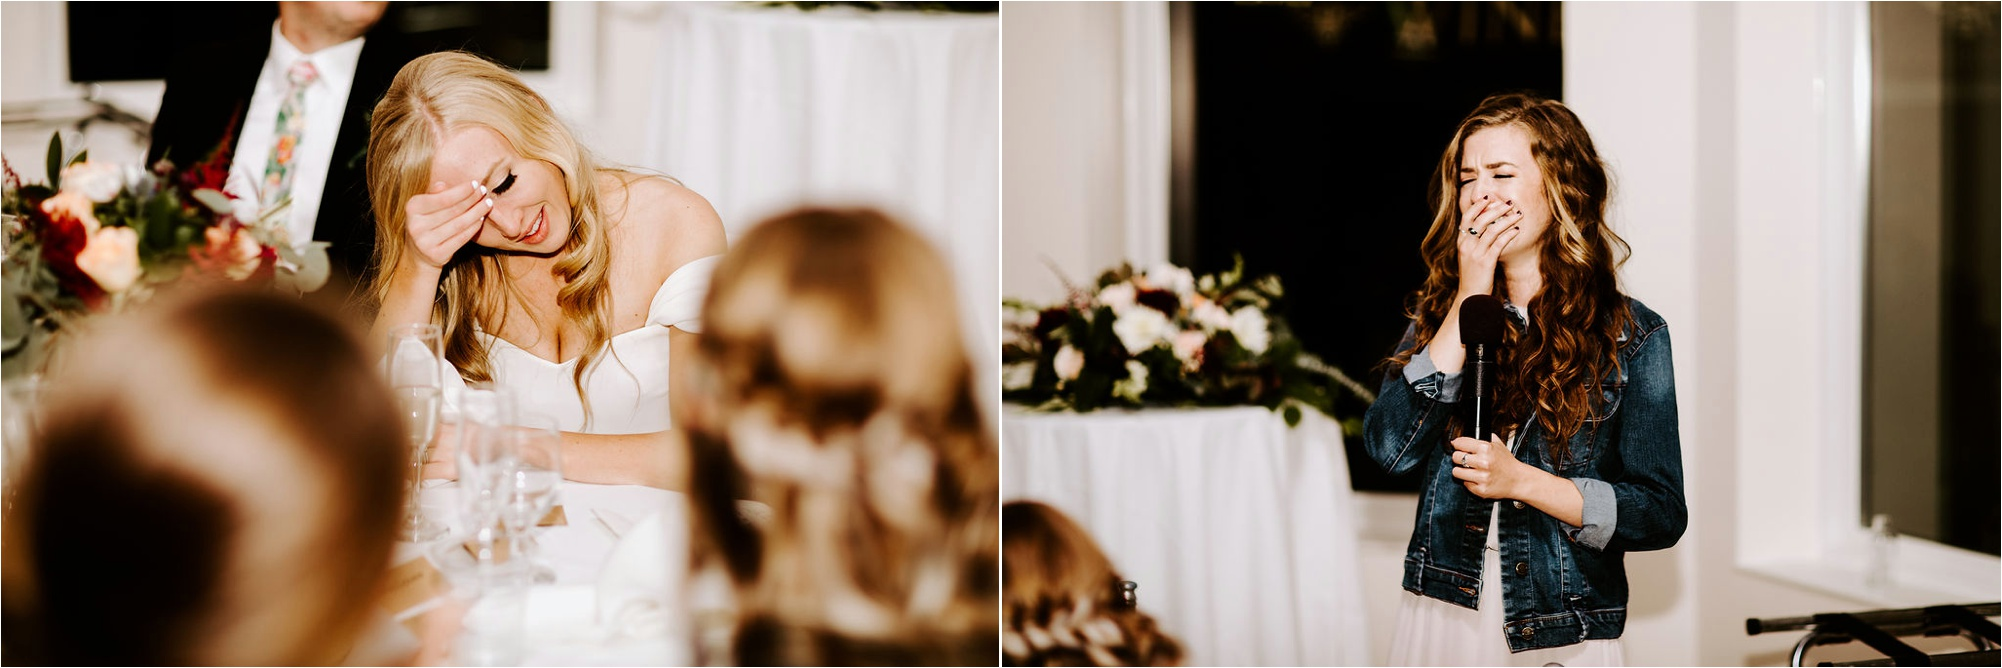 Winehaven Taylor's Falls Fall Wedding Minnesota Photographer_3895.jpg